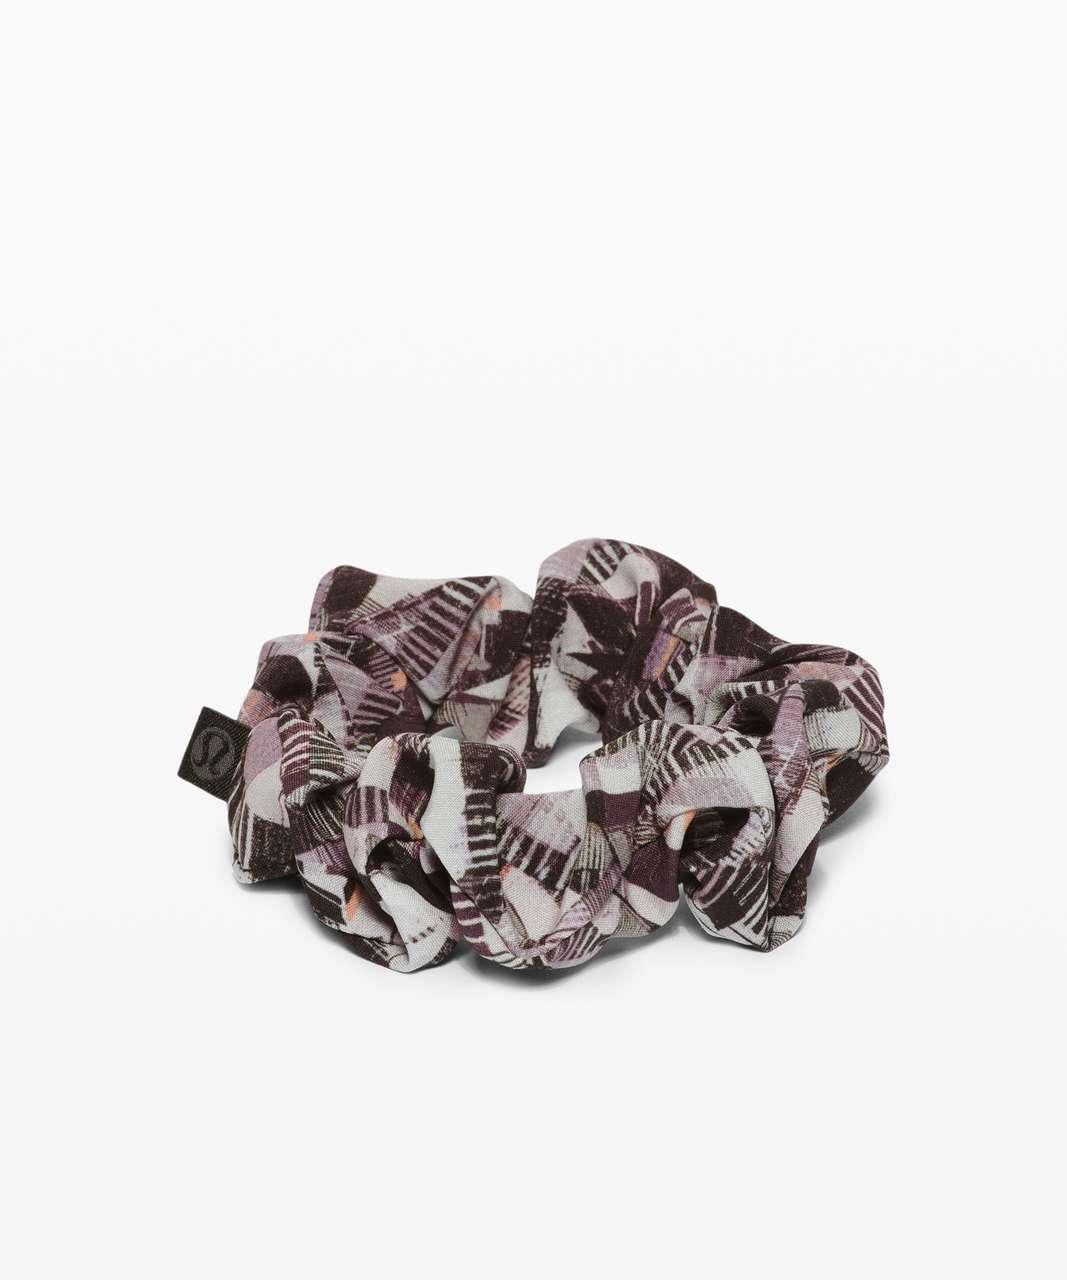 Lululemon Uplifting Scrunchie - Kaleidoscopic Pink Multi